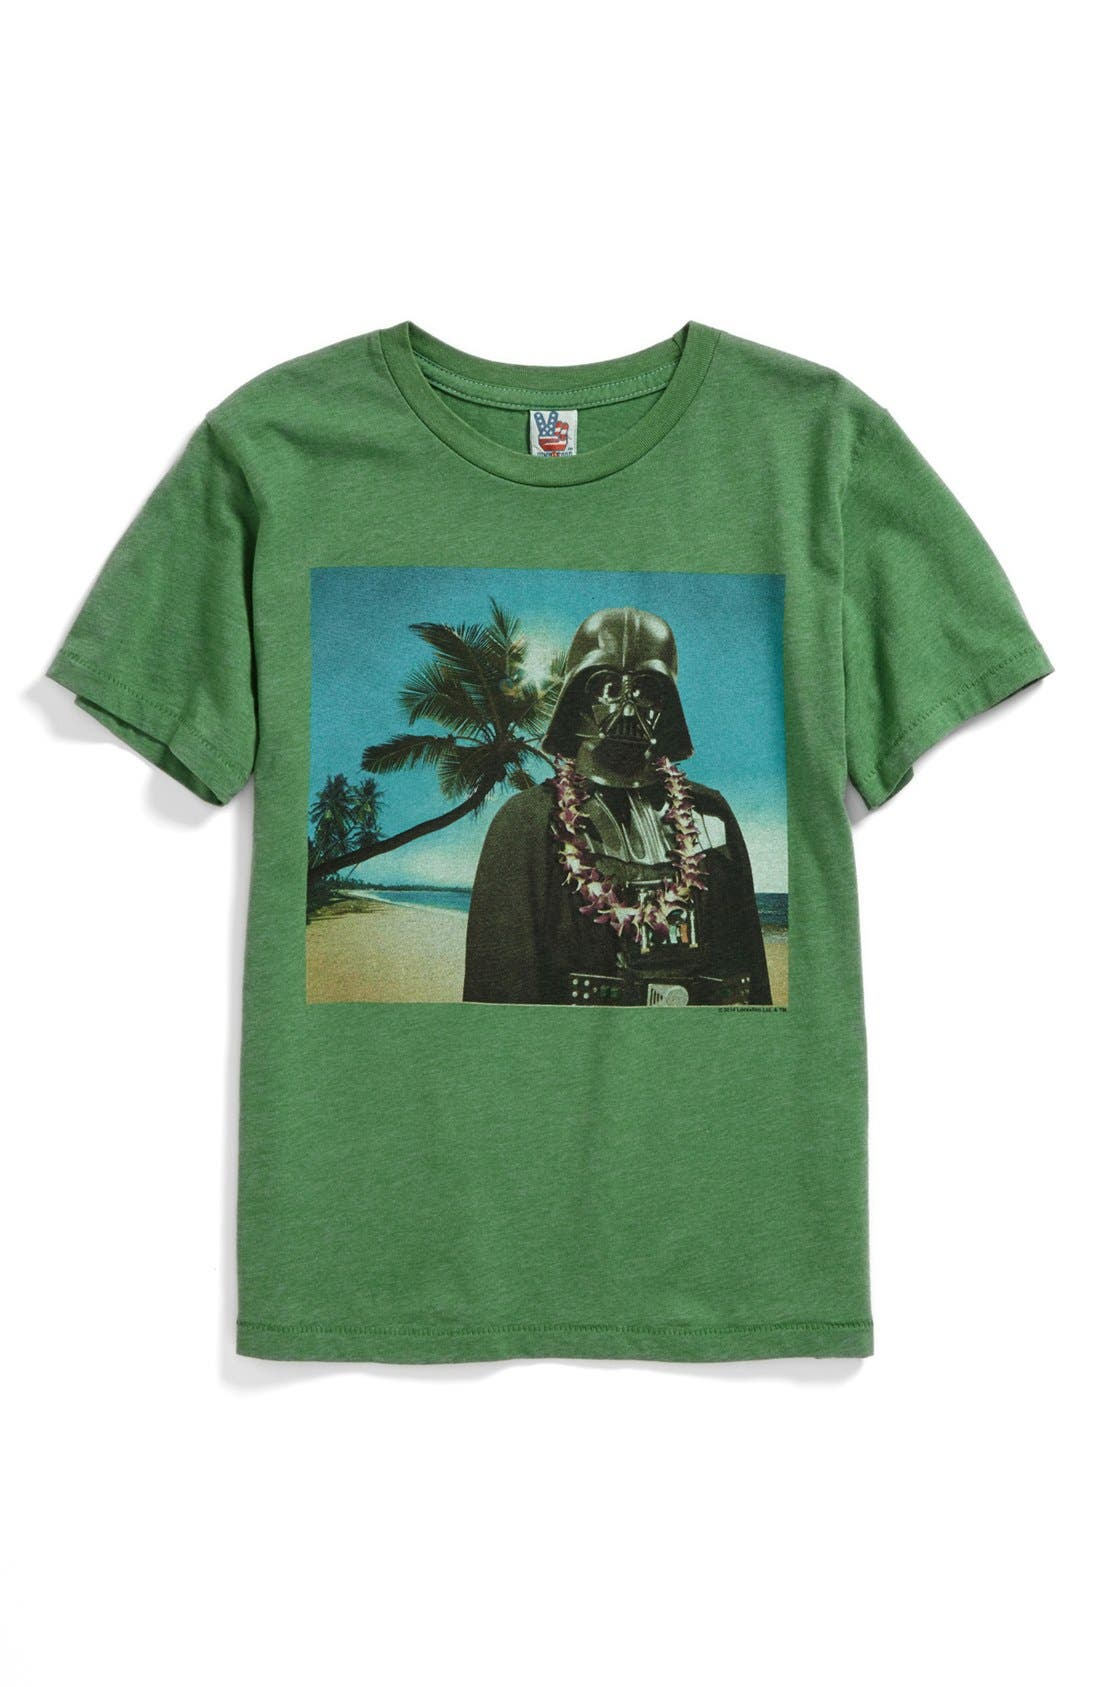 Alternate Image 1 Selected - Junk Food 'Vader Vacation' T-Shirt (Toddler Boys)